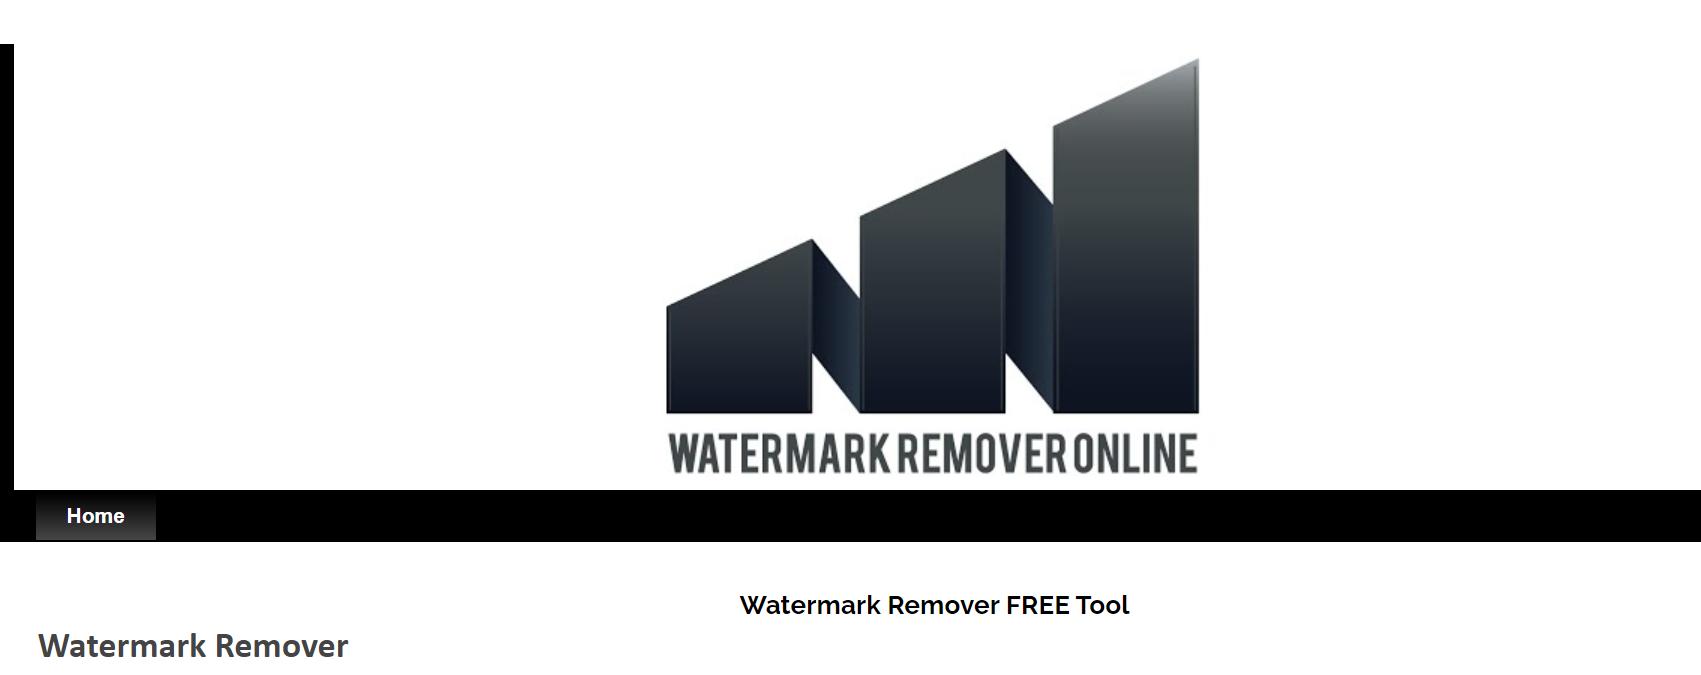 watermark-remover-online-photo